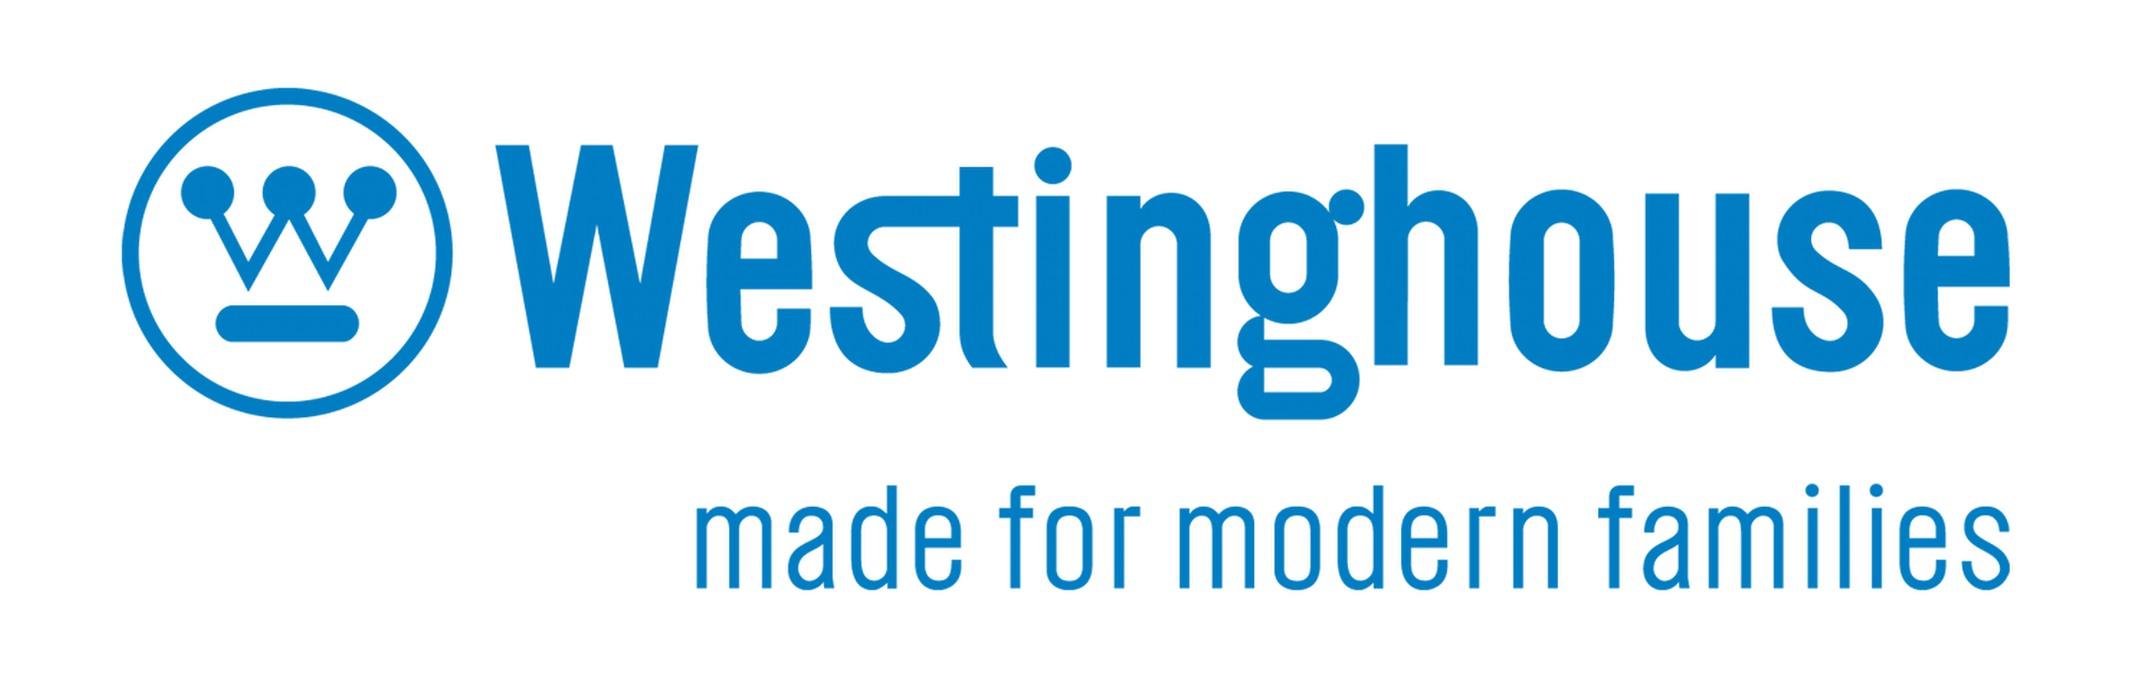 Westinghouse HVAC logo